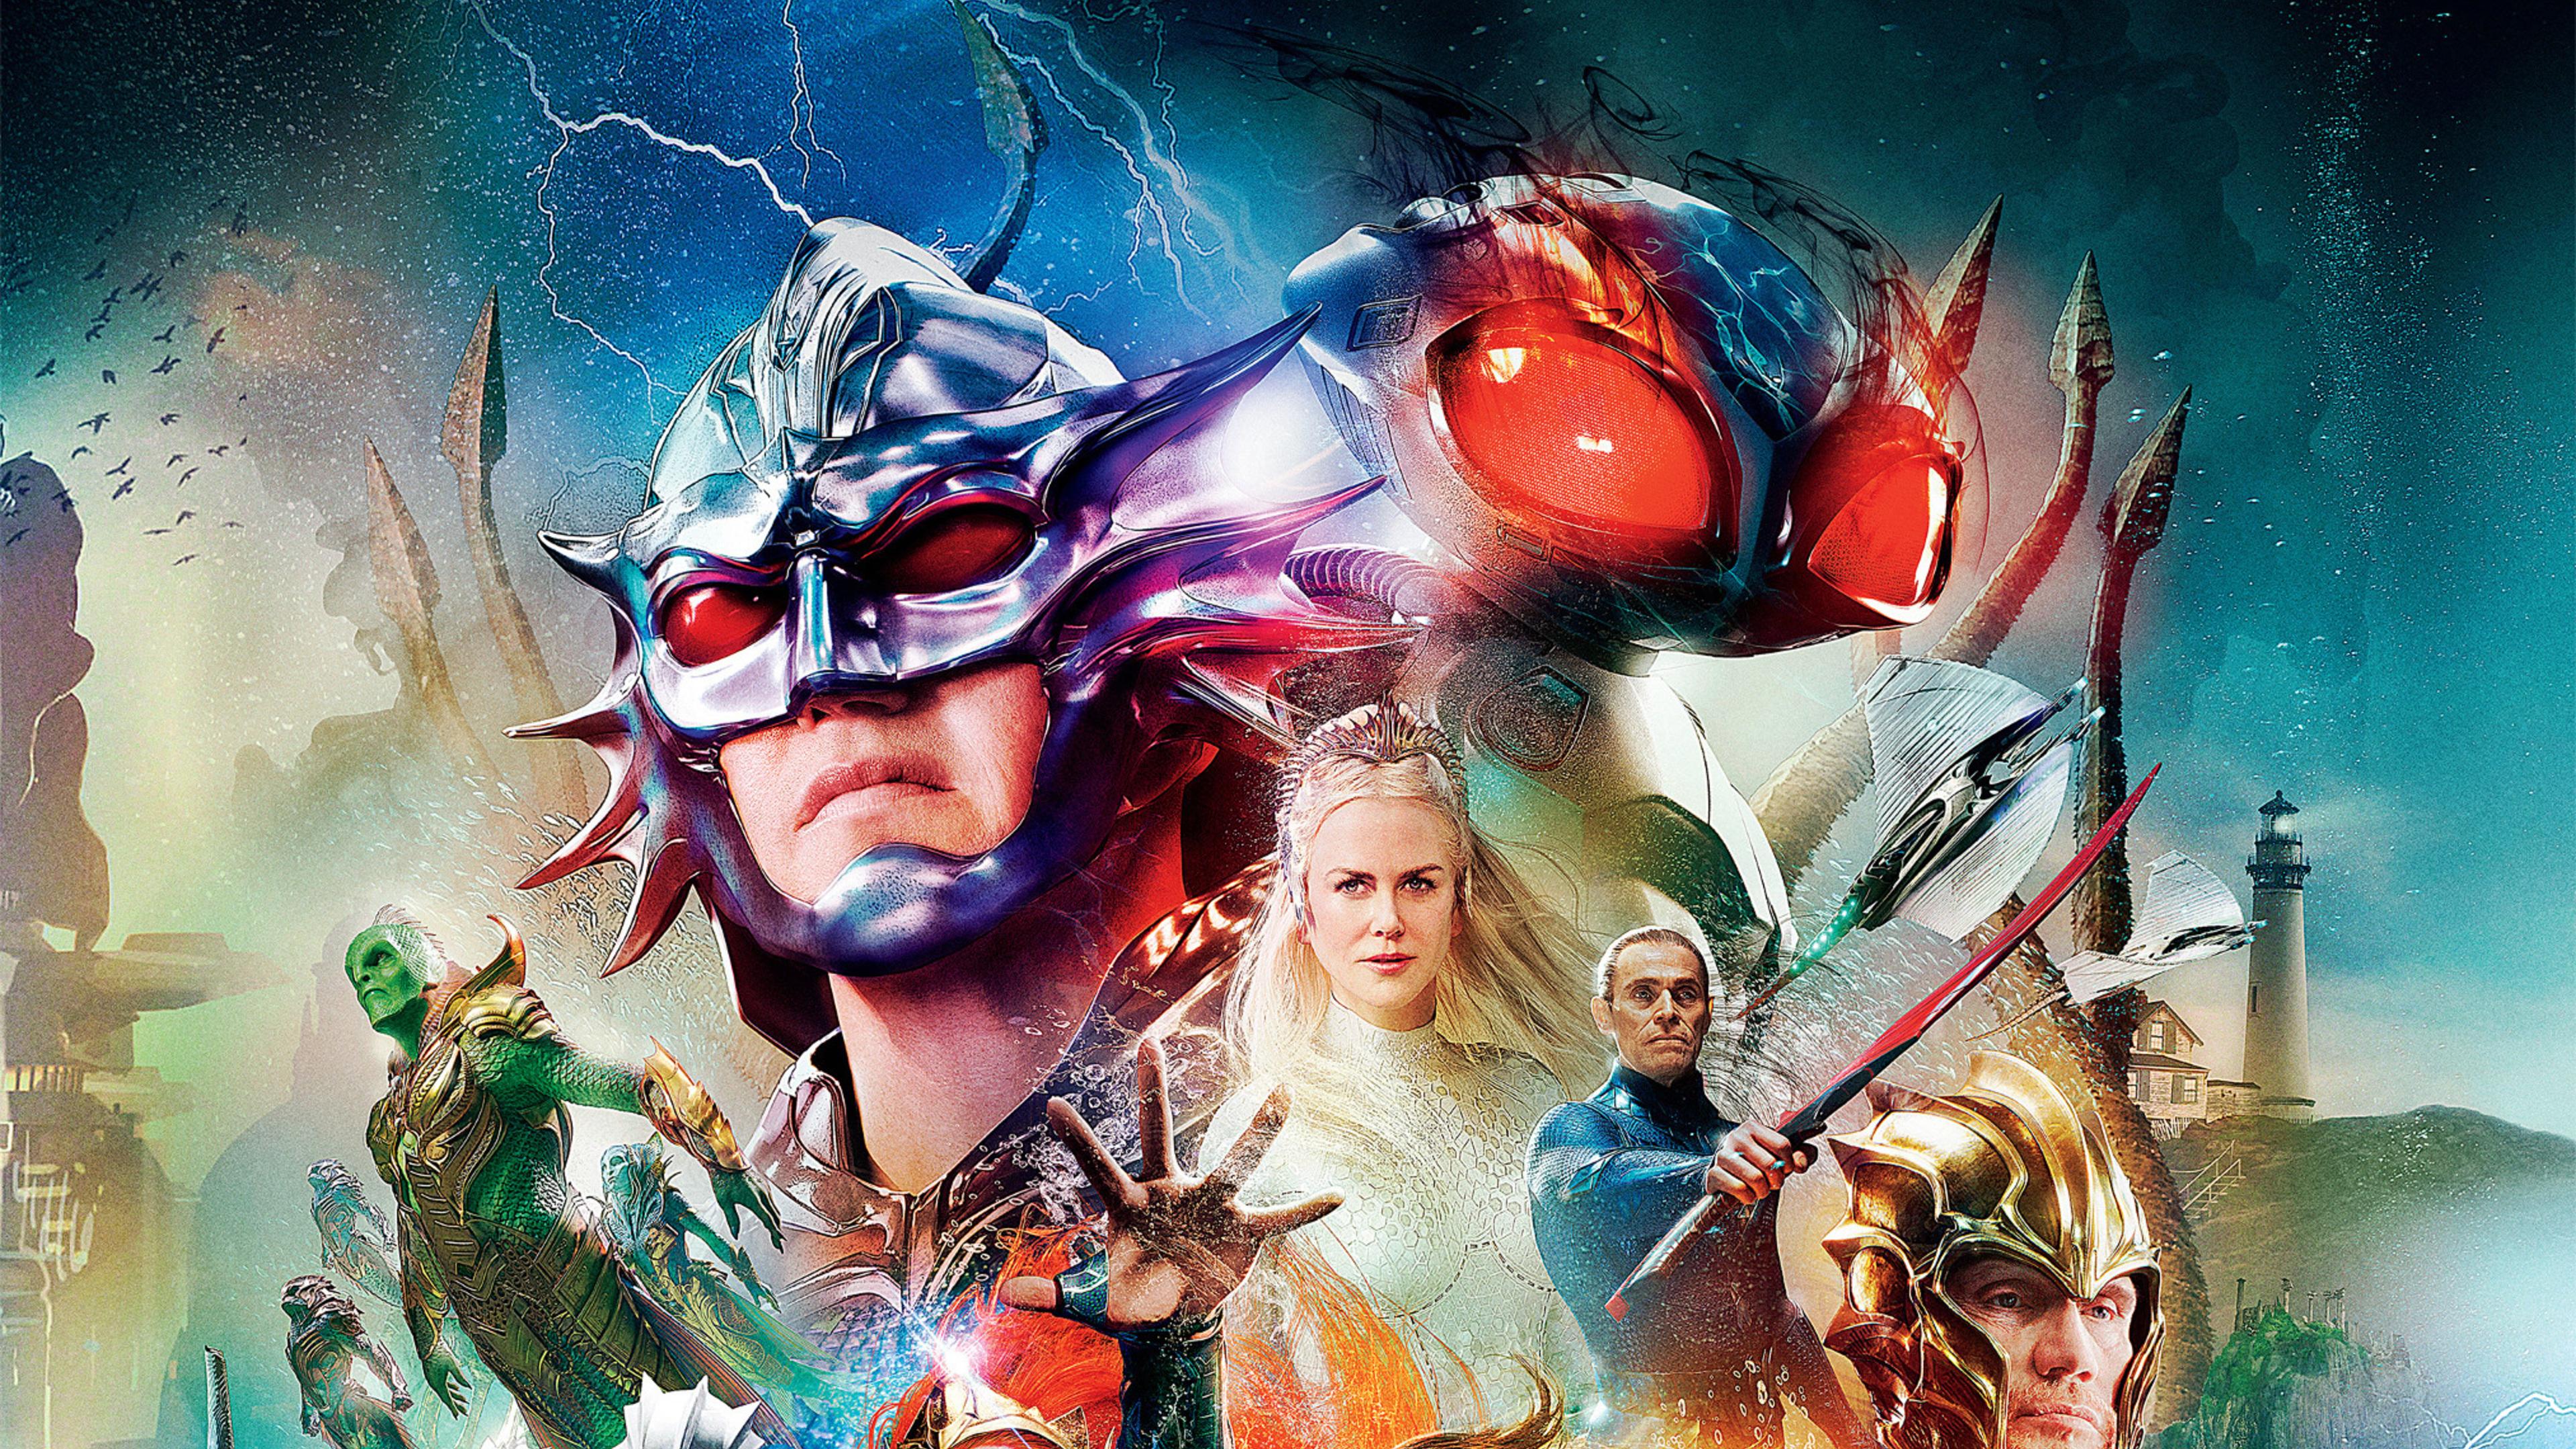 Aquaman 2018 Movie Cover Poster 4k Wallpaper Best Wallpapers